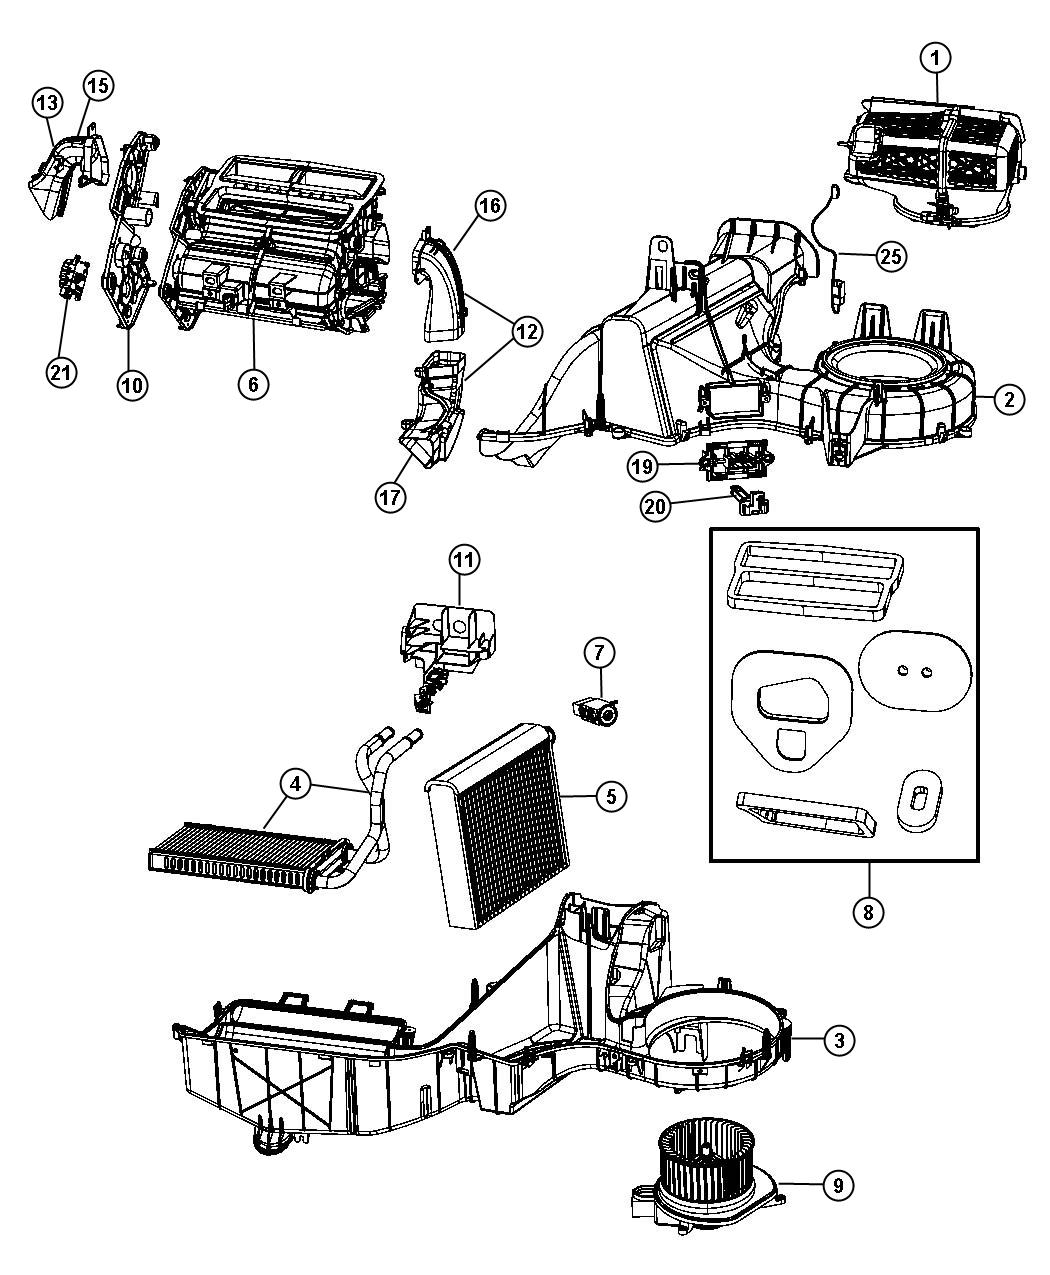 2008 dodge nitro ac wiring diagram